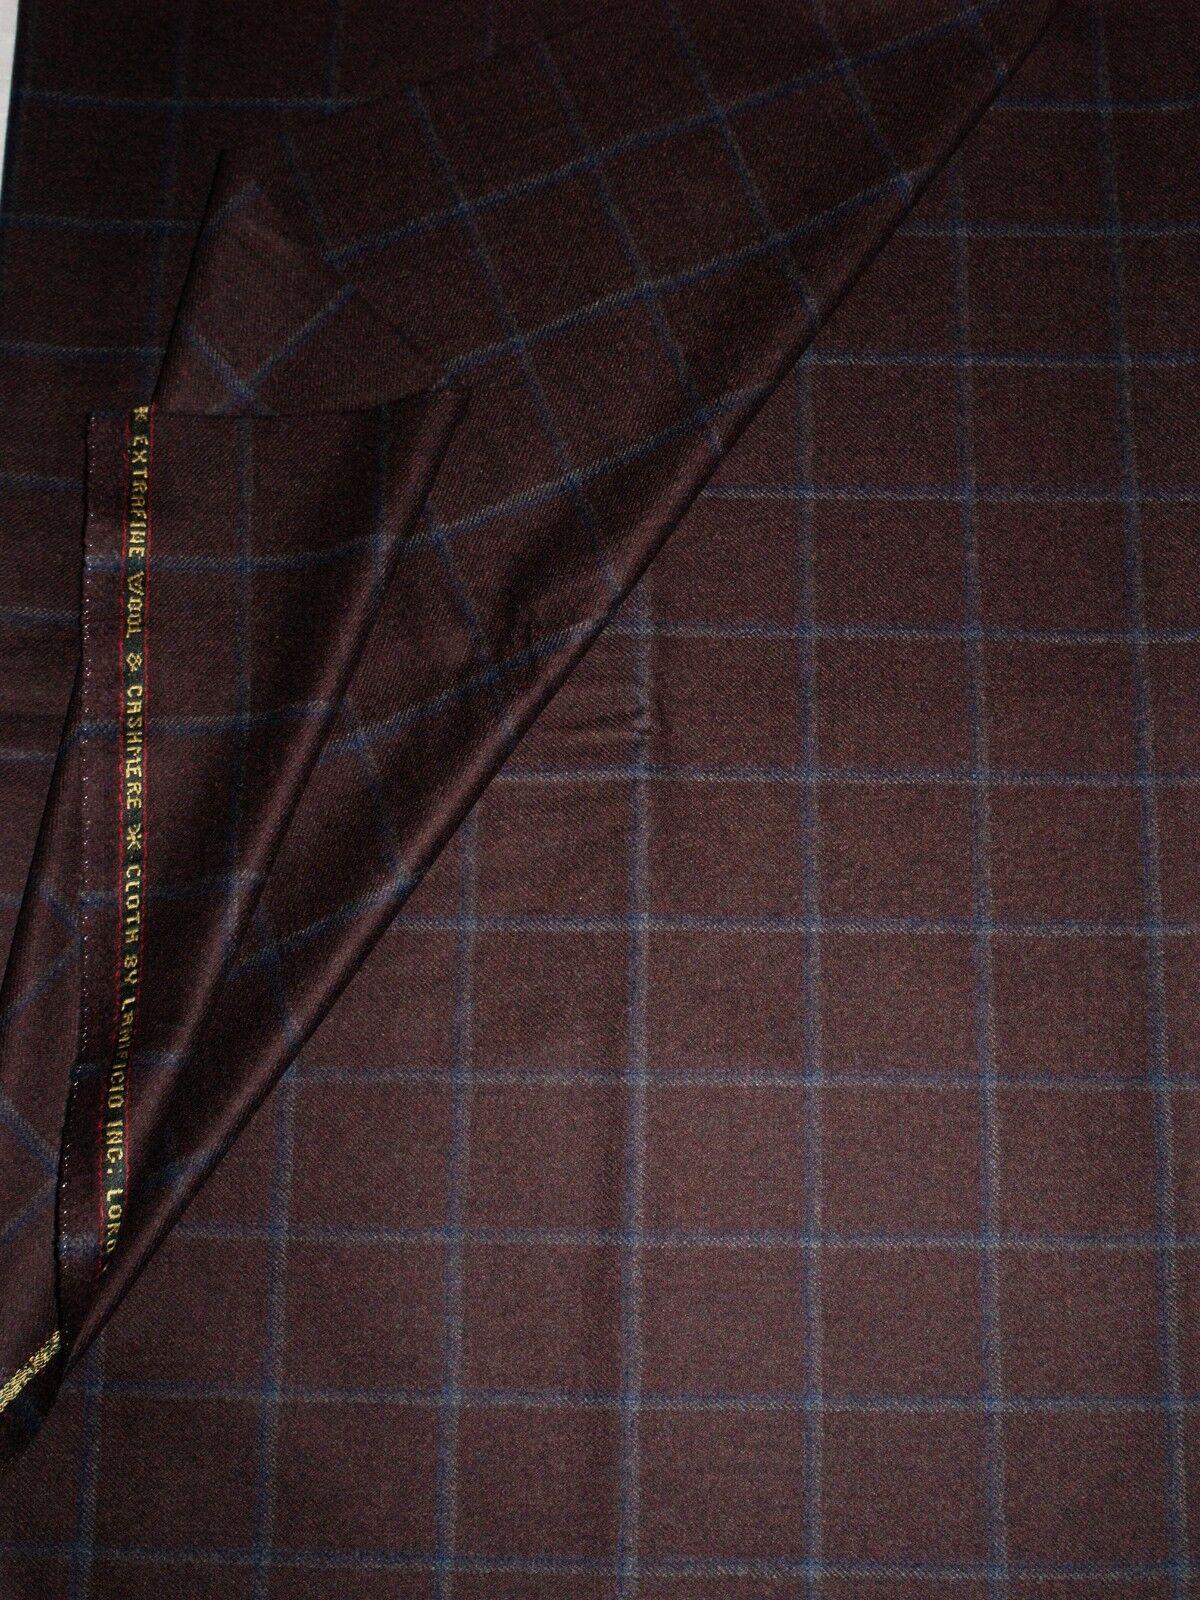 Lgold Piana Cashmere Lana  Tessuto - Taglio giacca 2 m